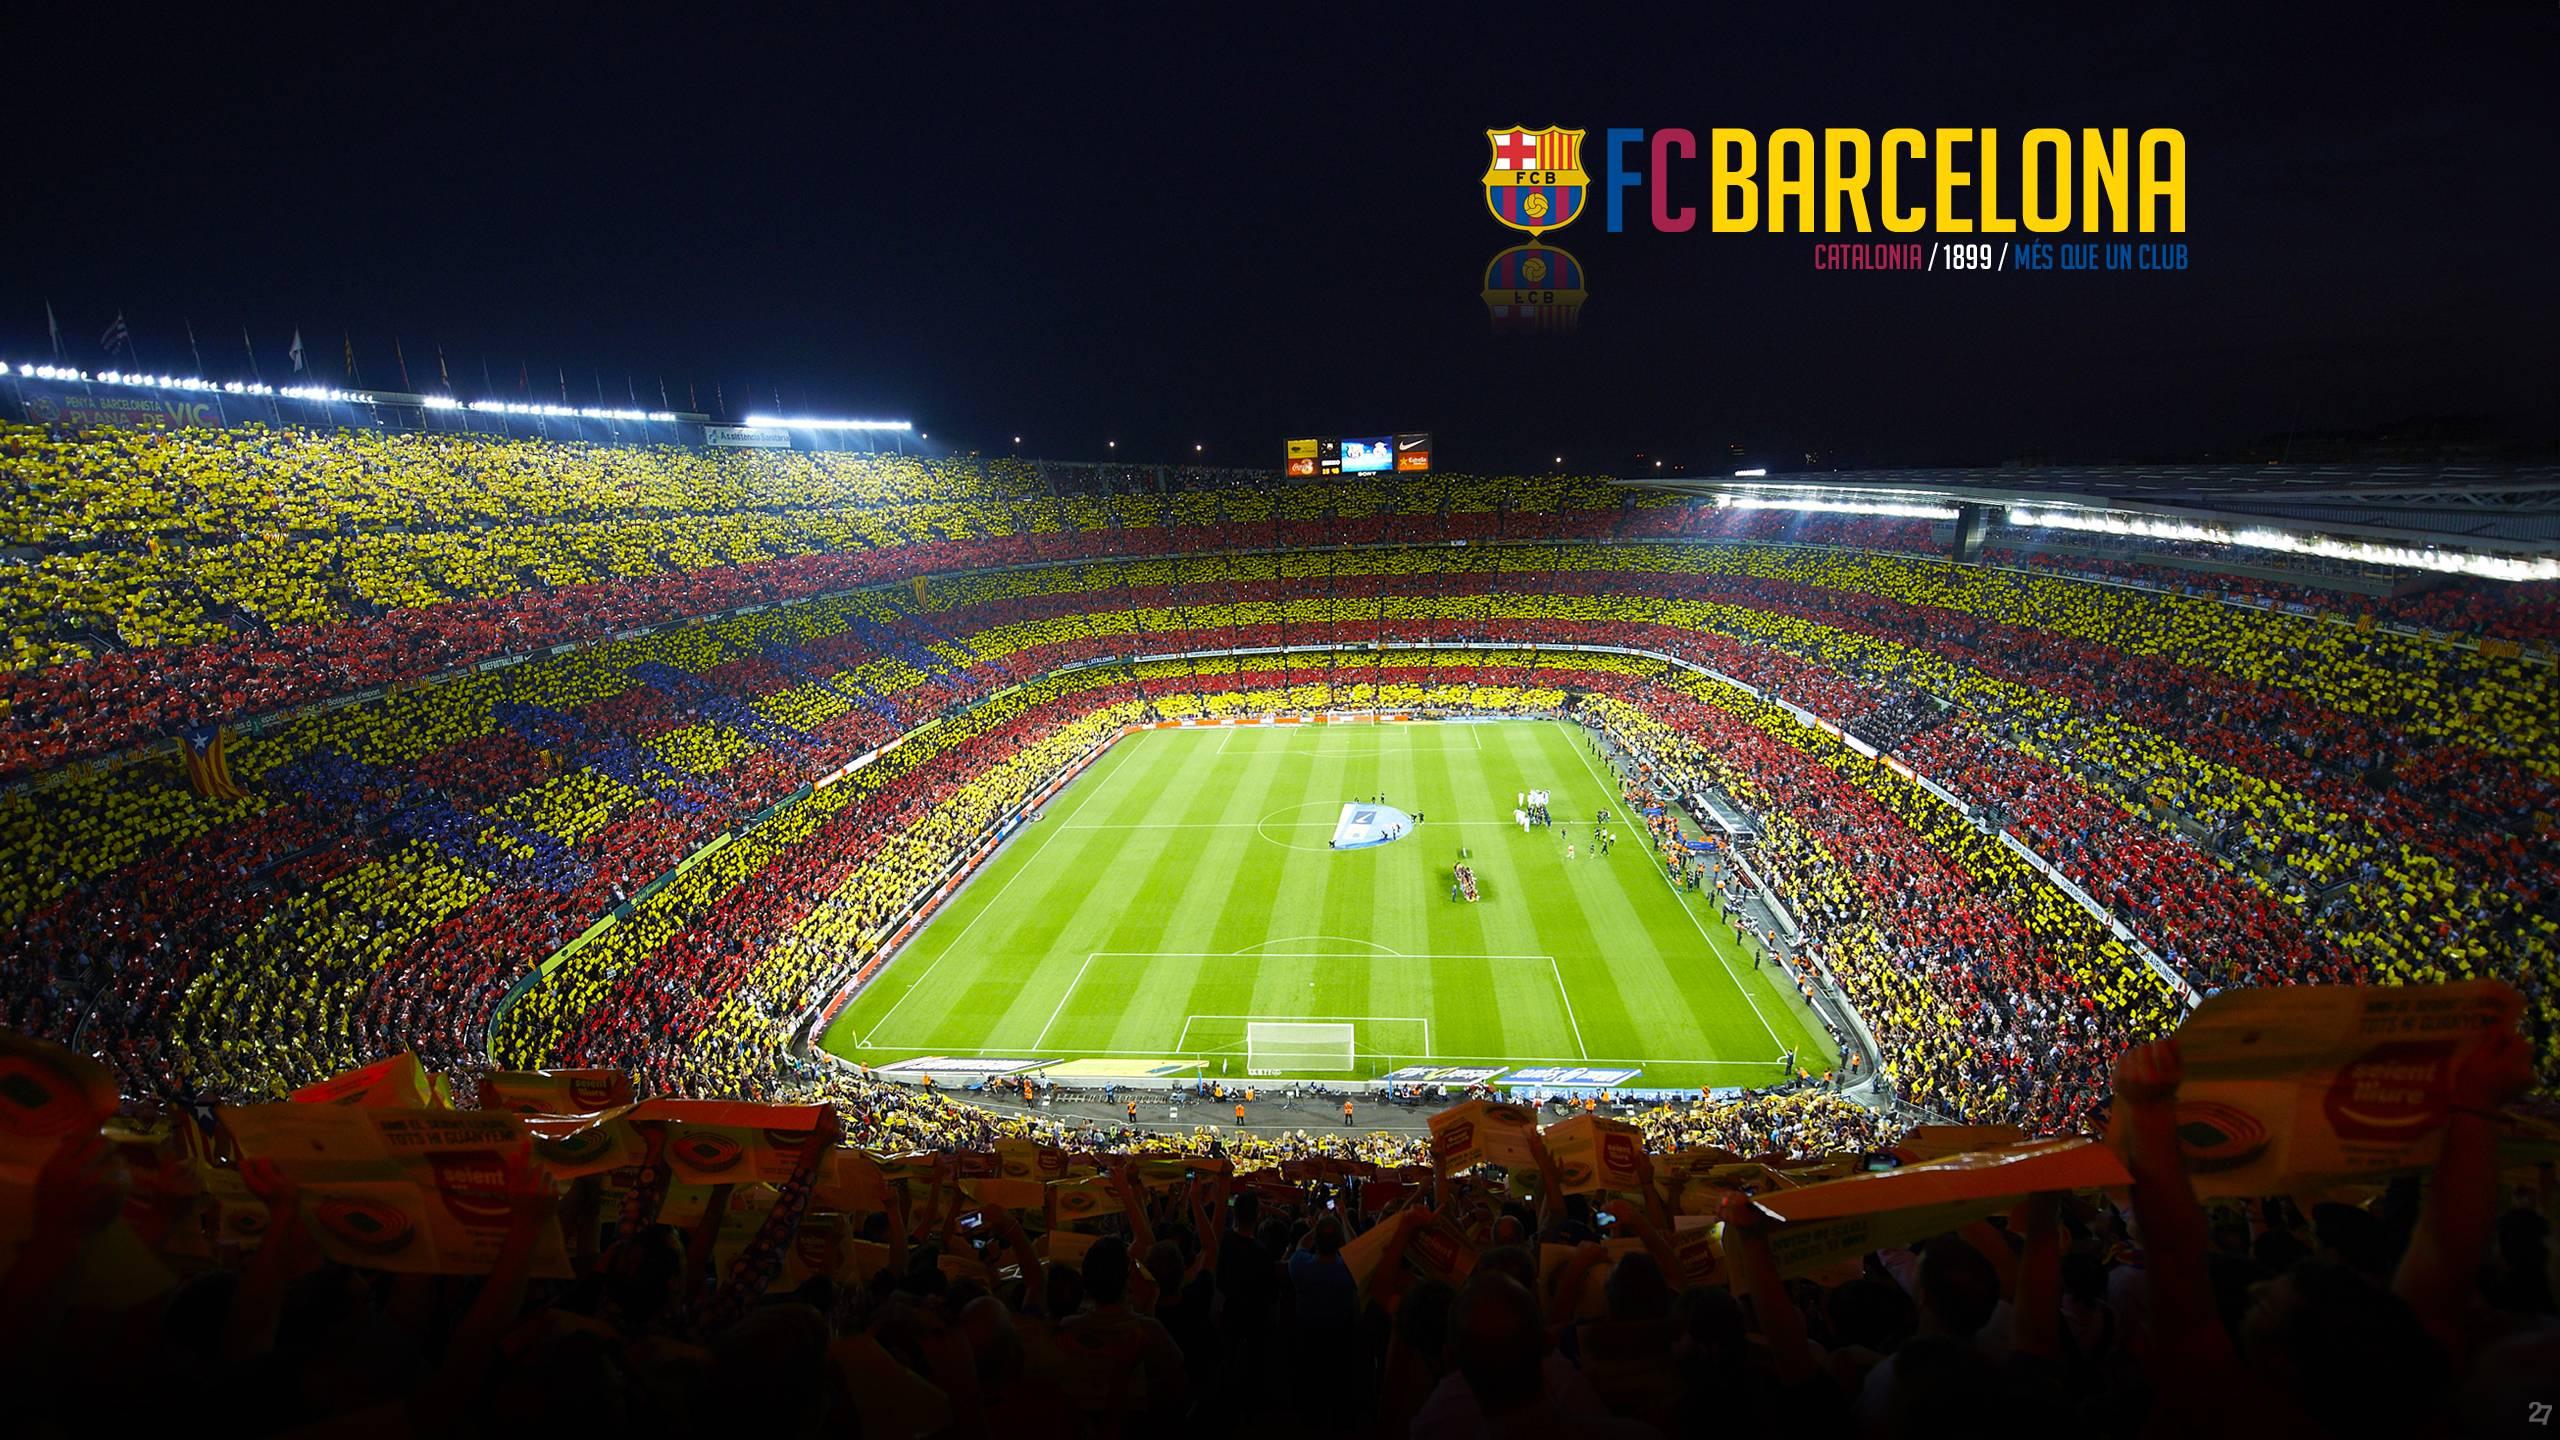 Camp Nou Wallpapers 2560x1440